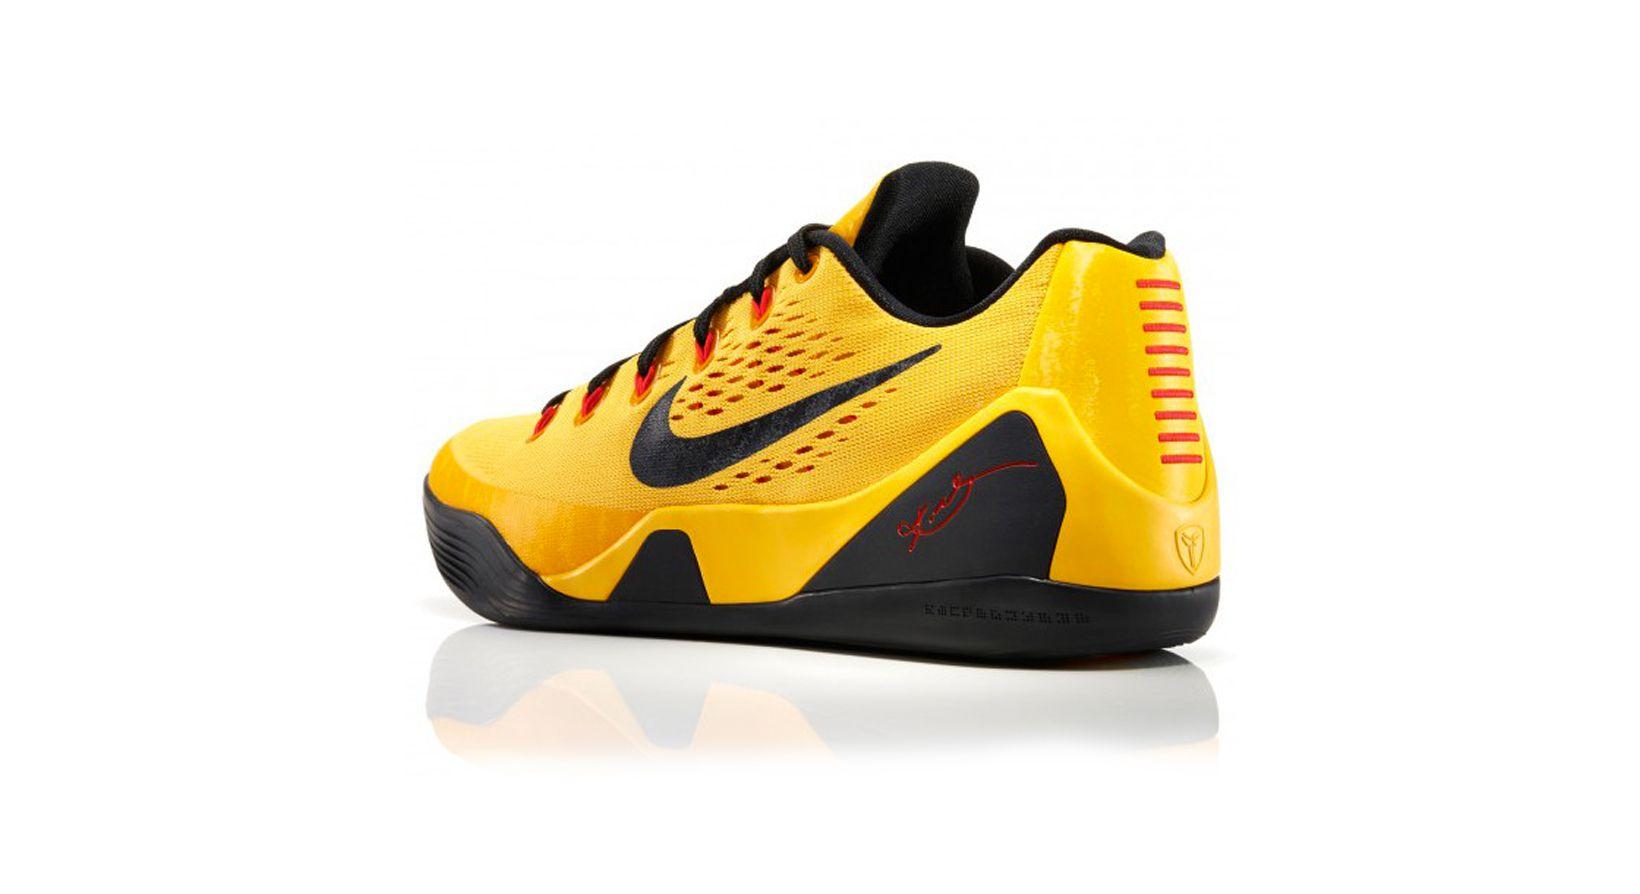 114 Best Awesome Sneakers images | Sneakers, Sneakers nike, Nike